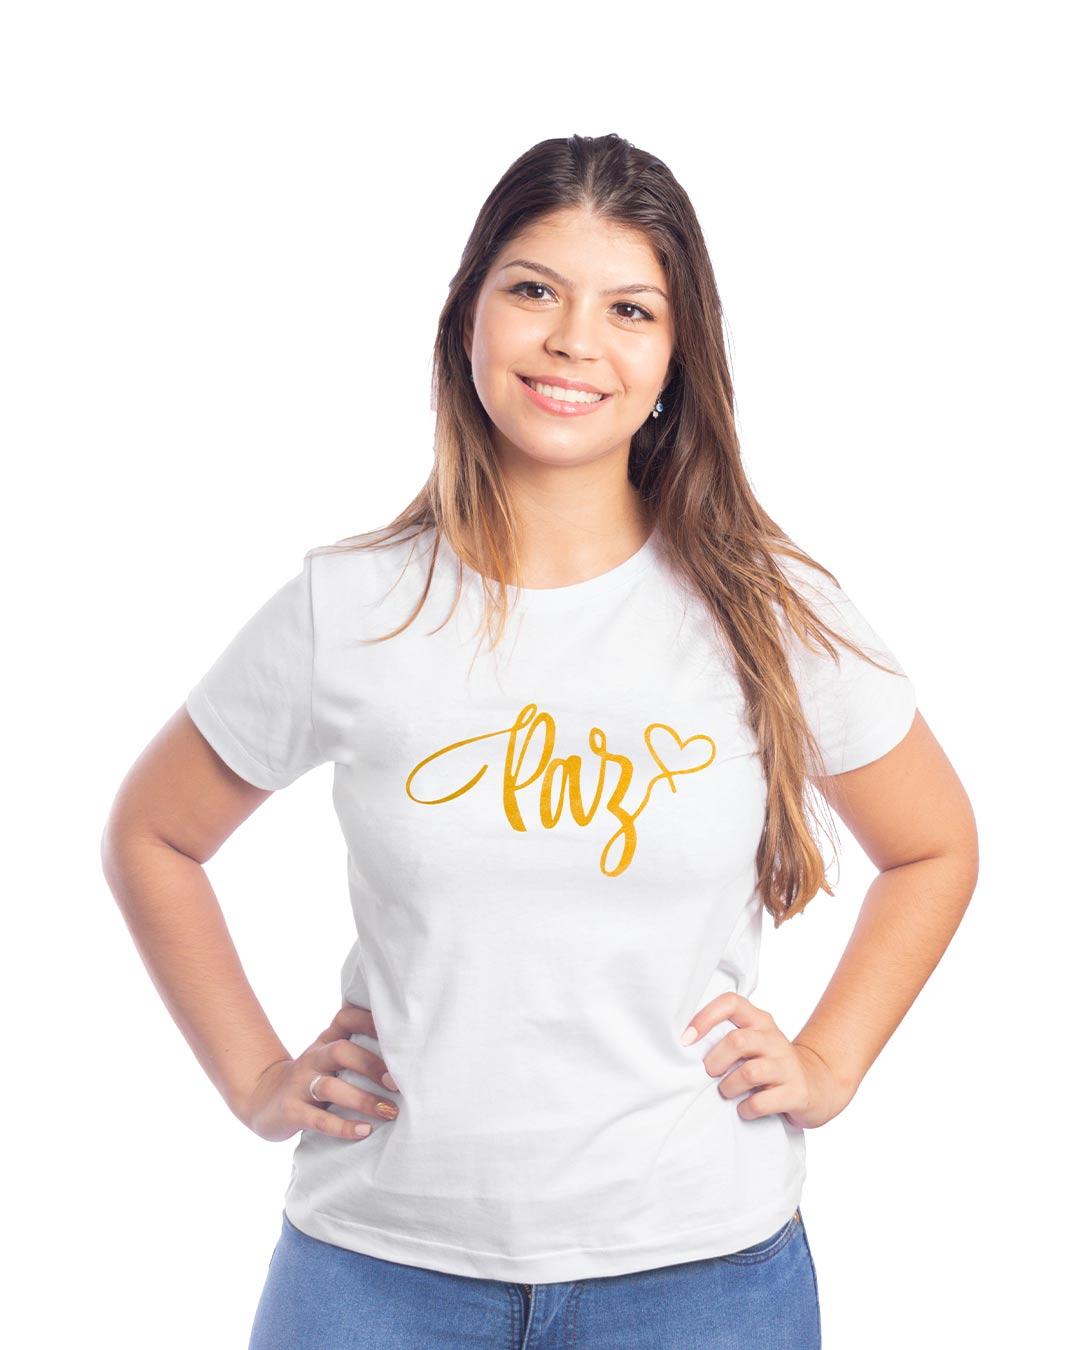 T-Shirt Adulta e Plus Size Paz Branco - Santa Margô